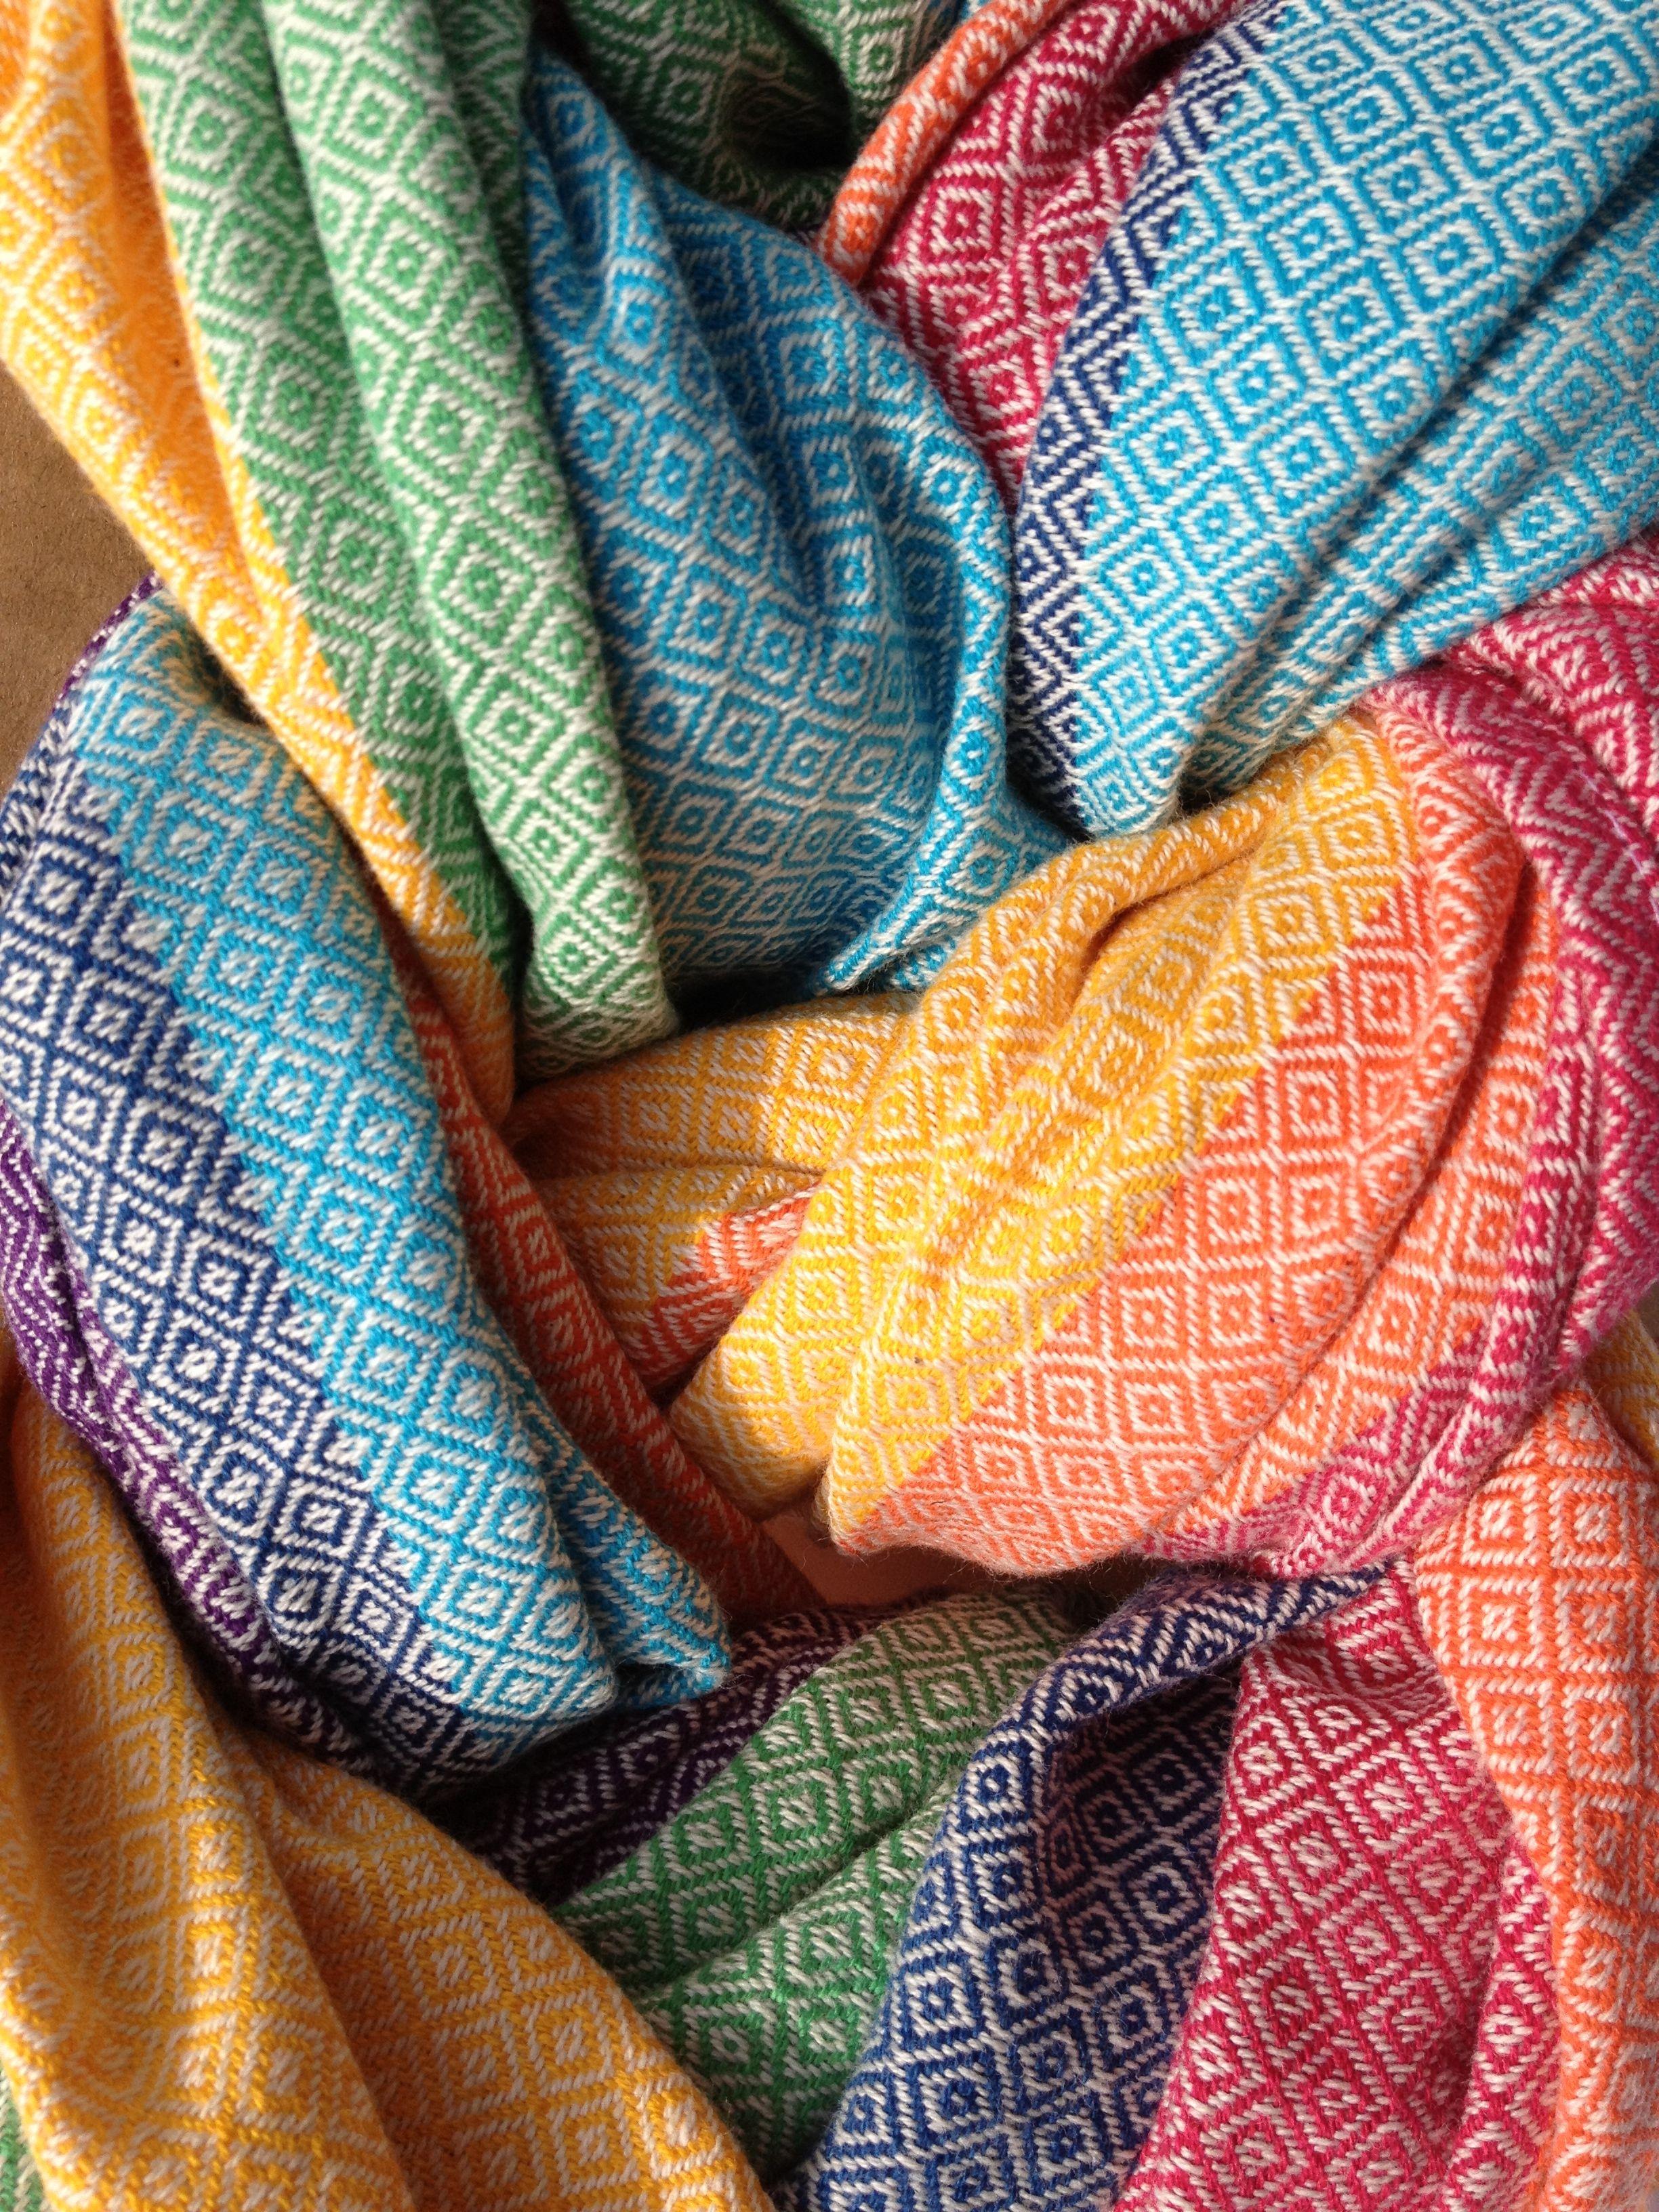 daeda3c5d56 Girasol Diamond Weave Snow Rainbow  dream wrap  http   abbycoop.files